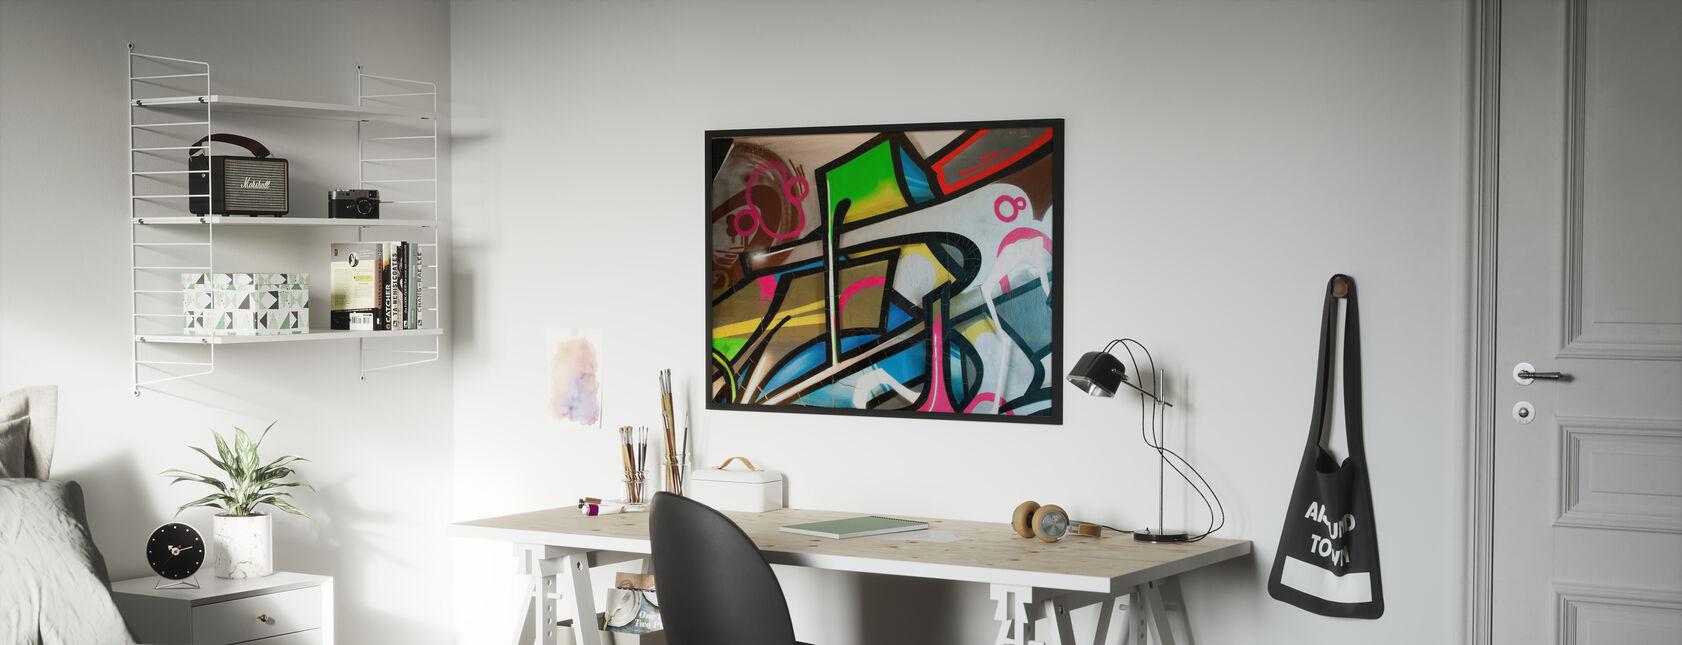 Fargerik Graffiti - Innrammet bilde - Barnerom